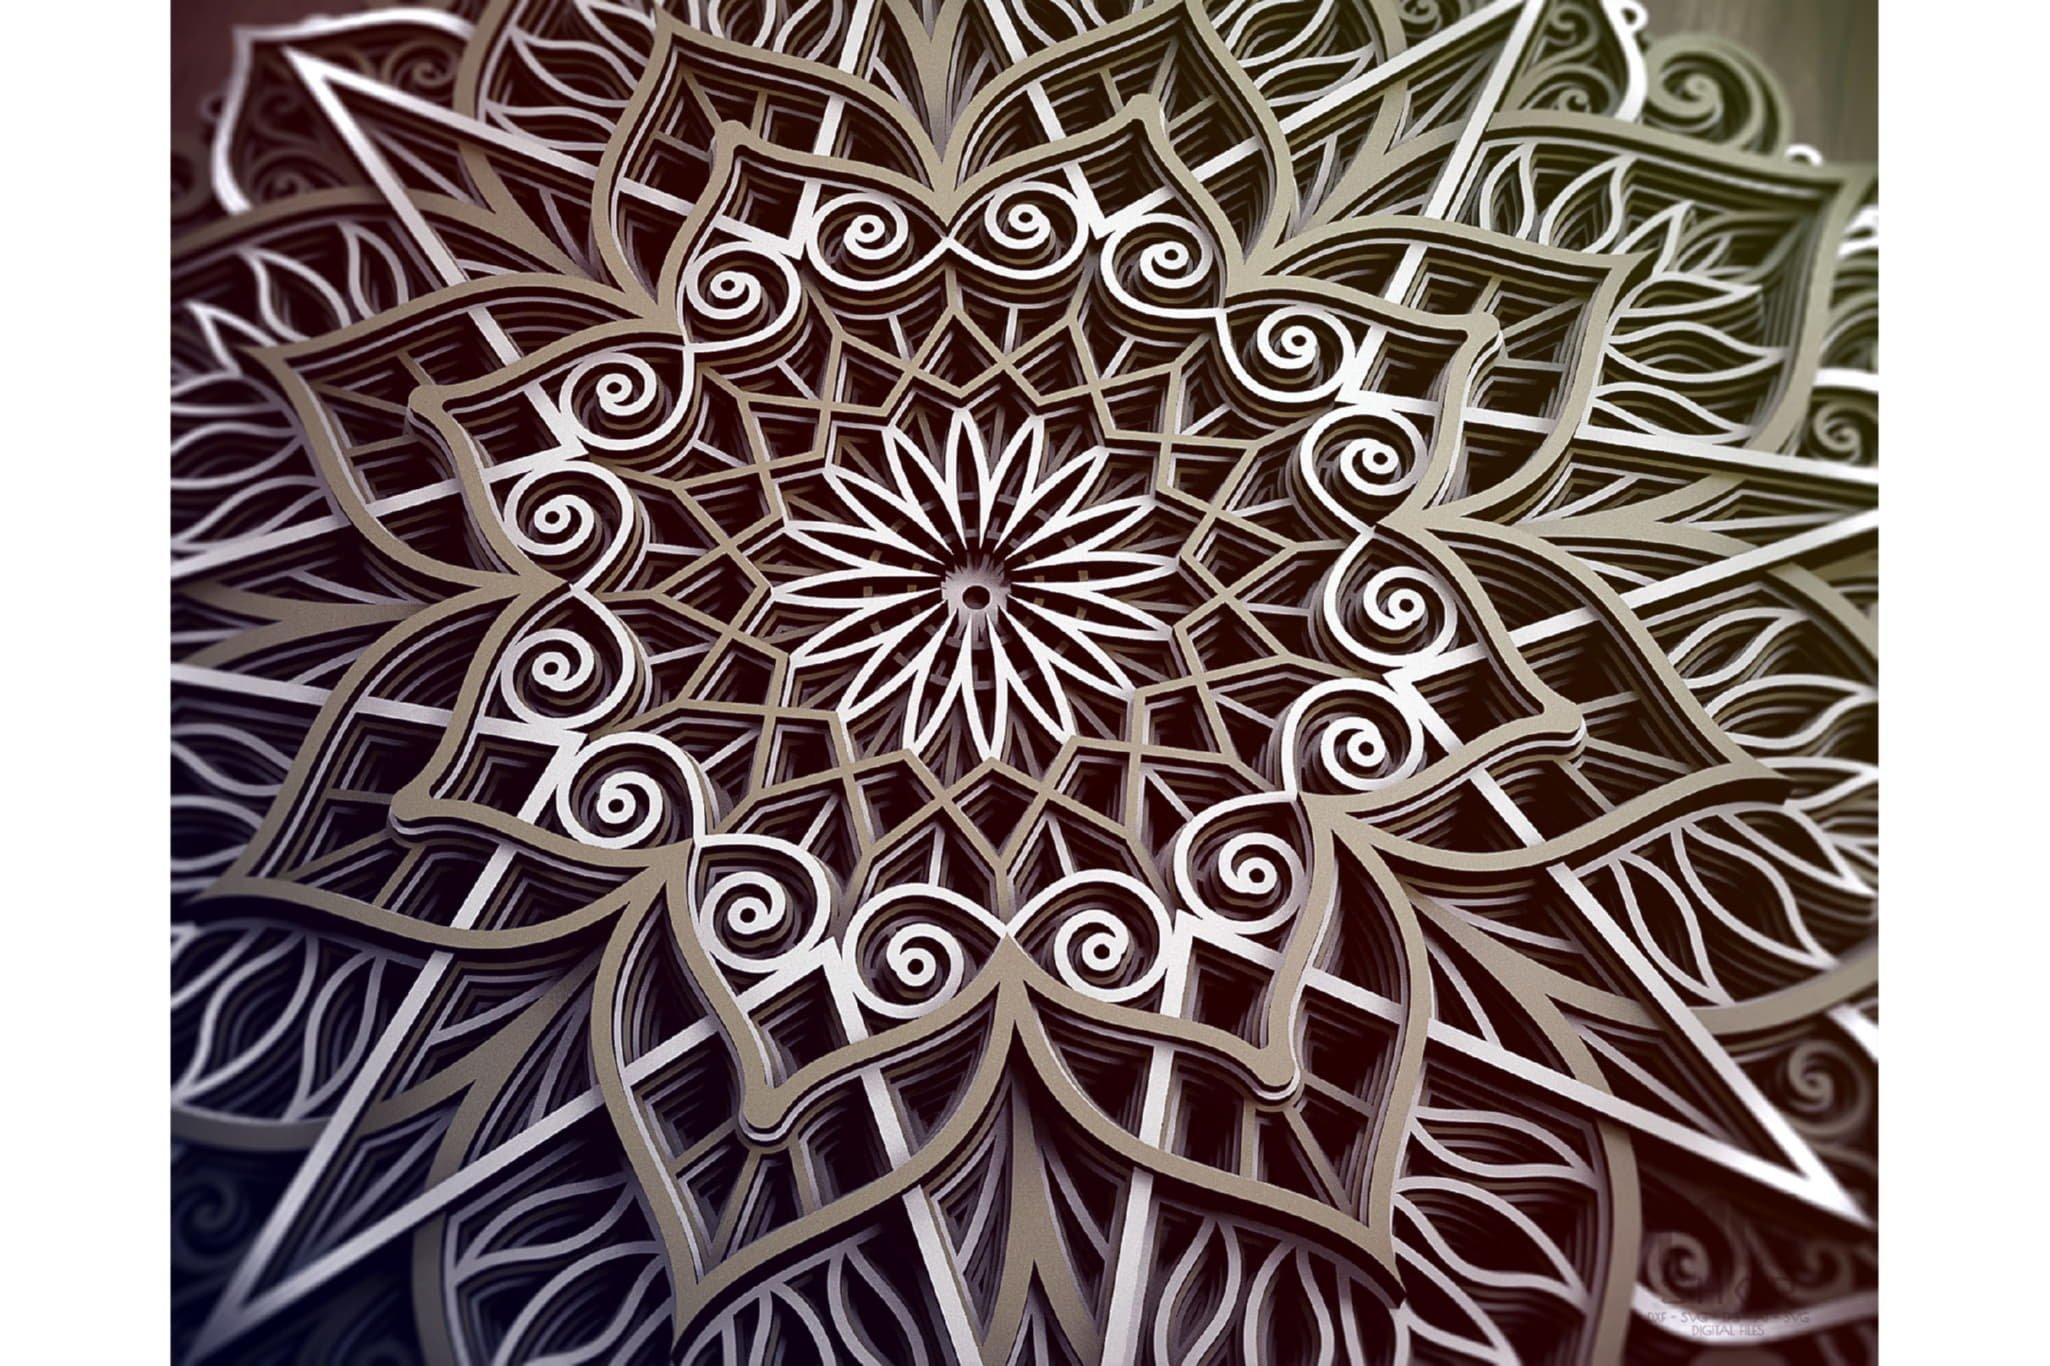 M89 - Mandala DXF Laser Cut Pattern, Flower mandala pattern example image 3